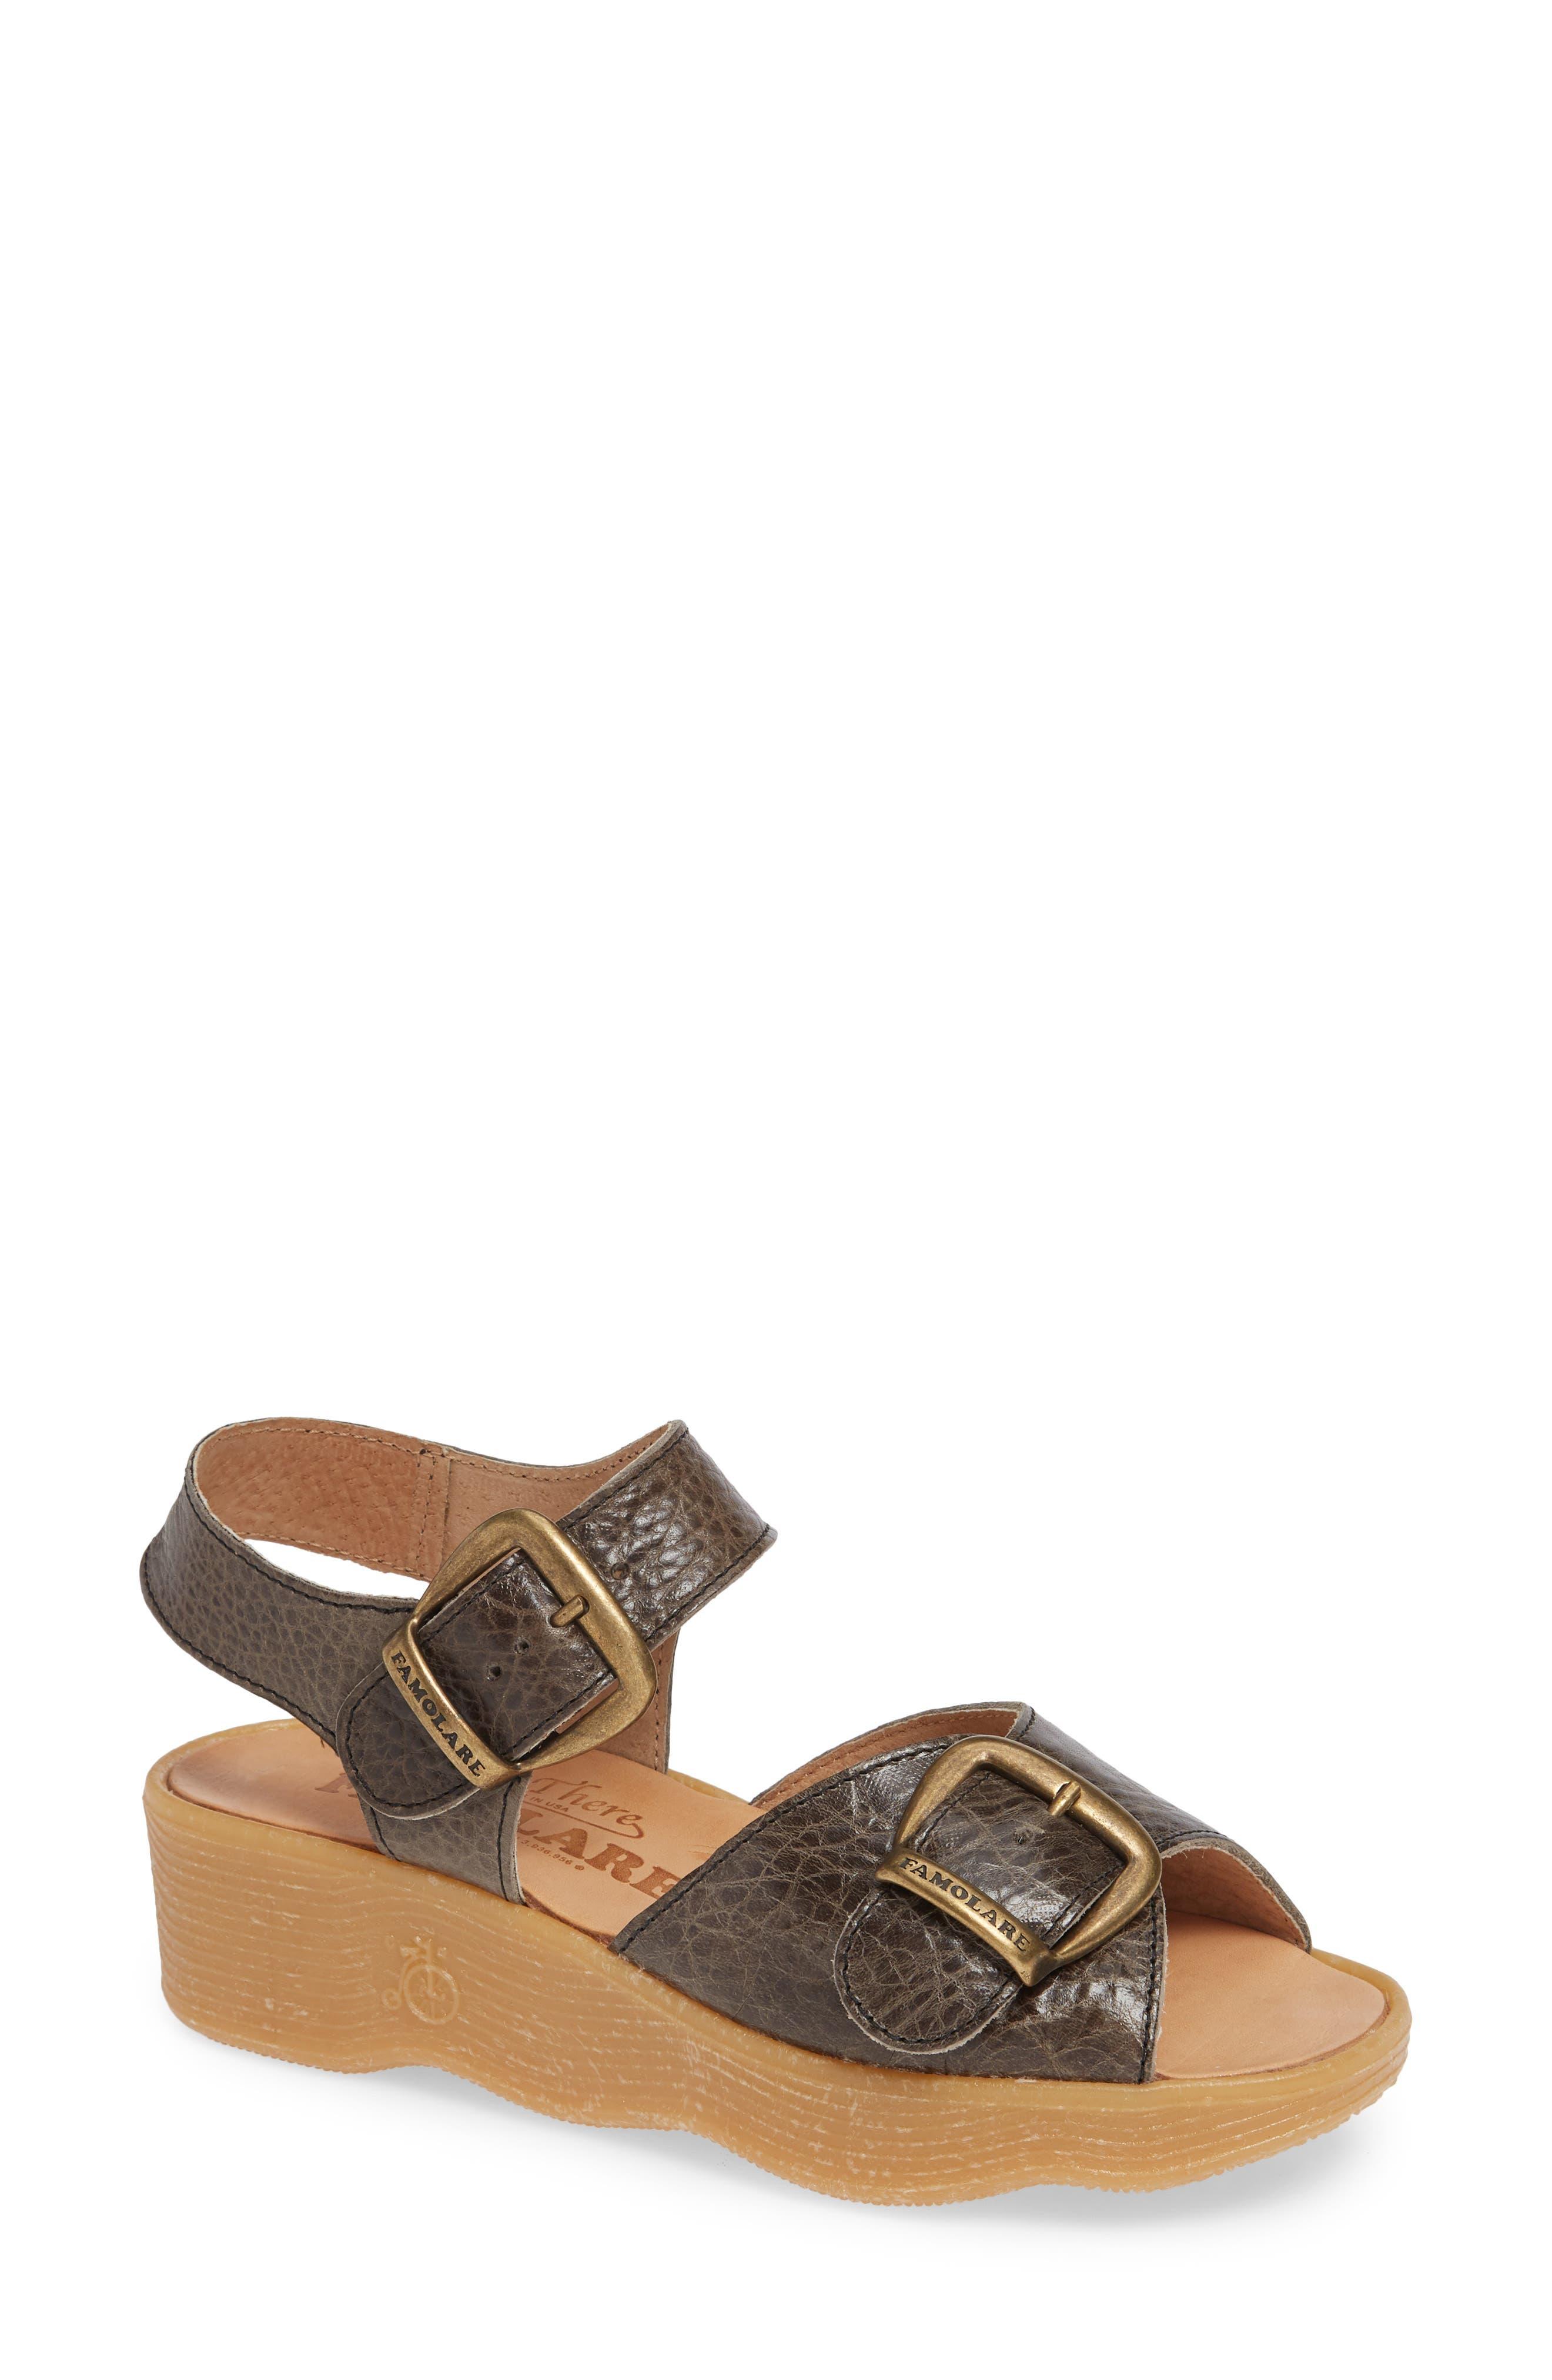 Double Play Platform Sandal,                             Main thumbnail 1, color,                             STEEL SUEDE